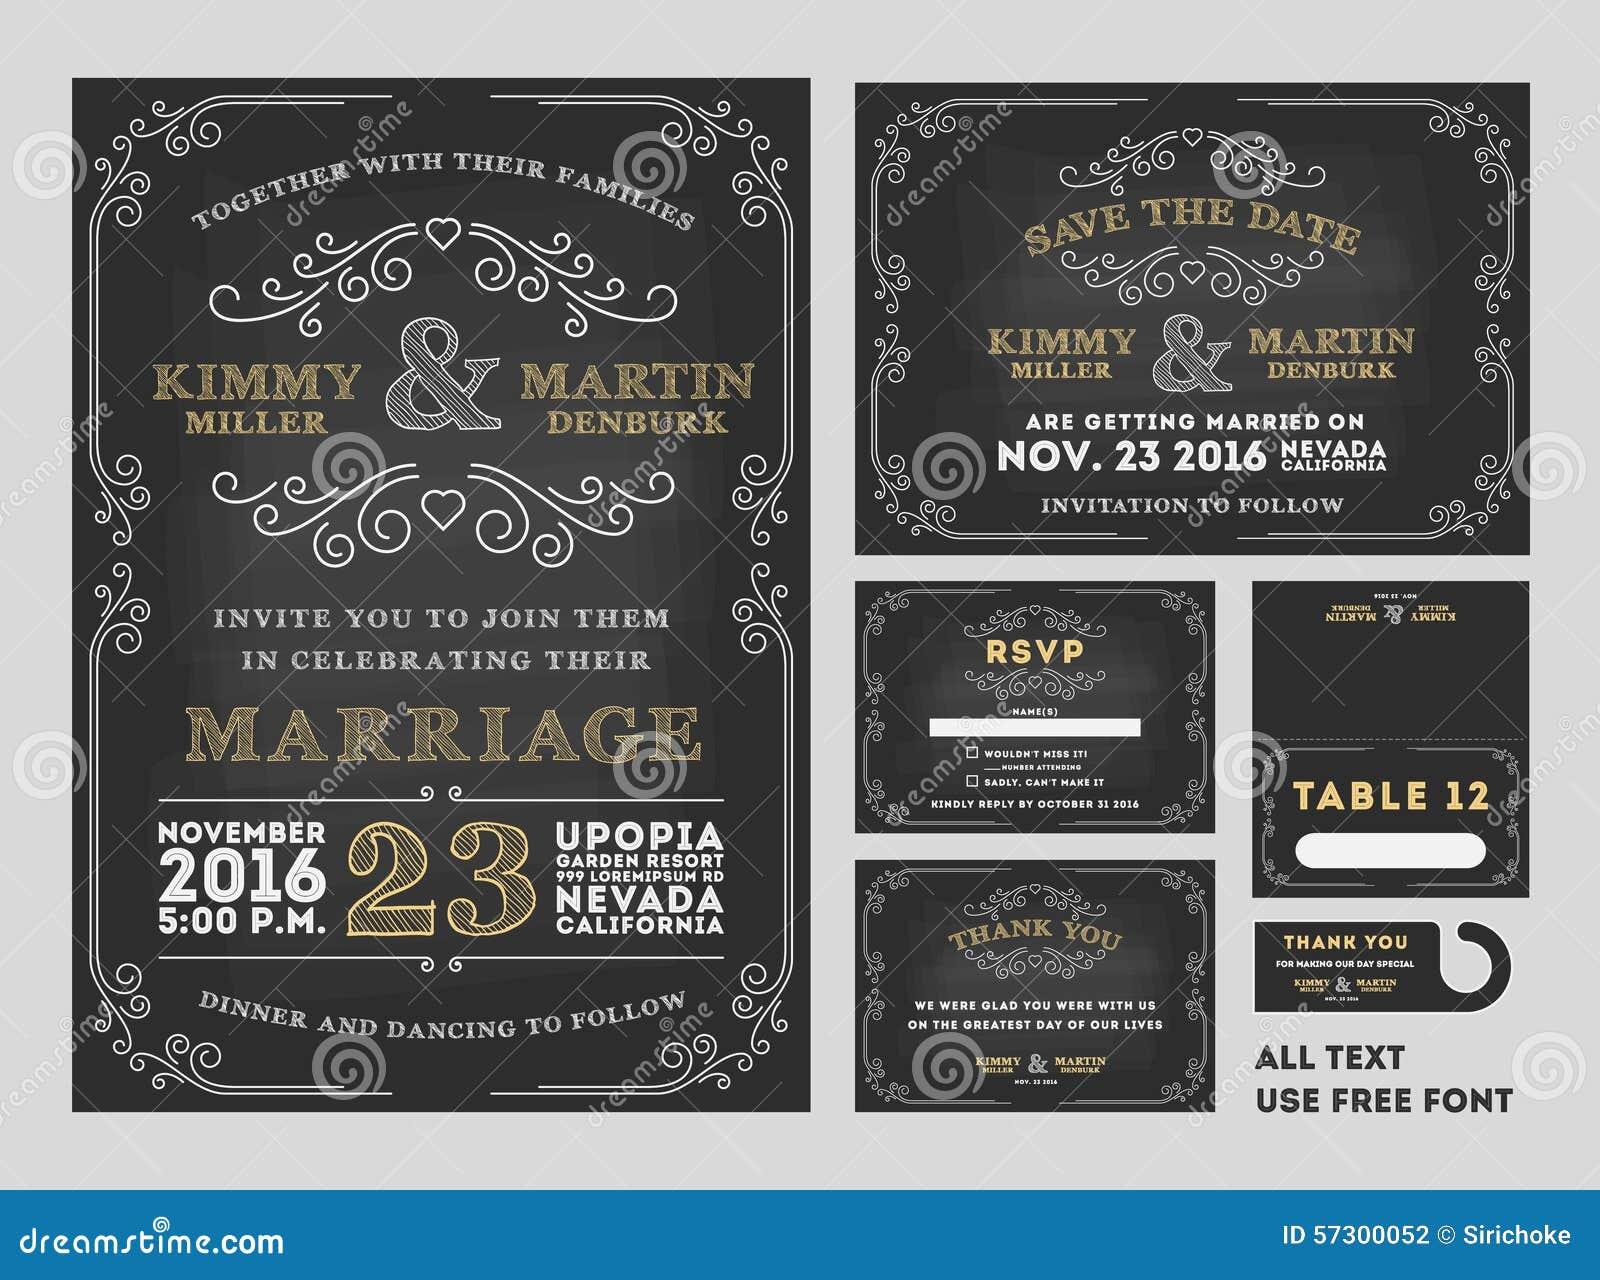 Wedding Invitations With Rsvp Cards Included: Vintage Chalkboard Wedding Invitations Design Sets Stock